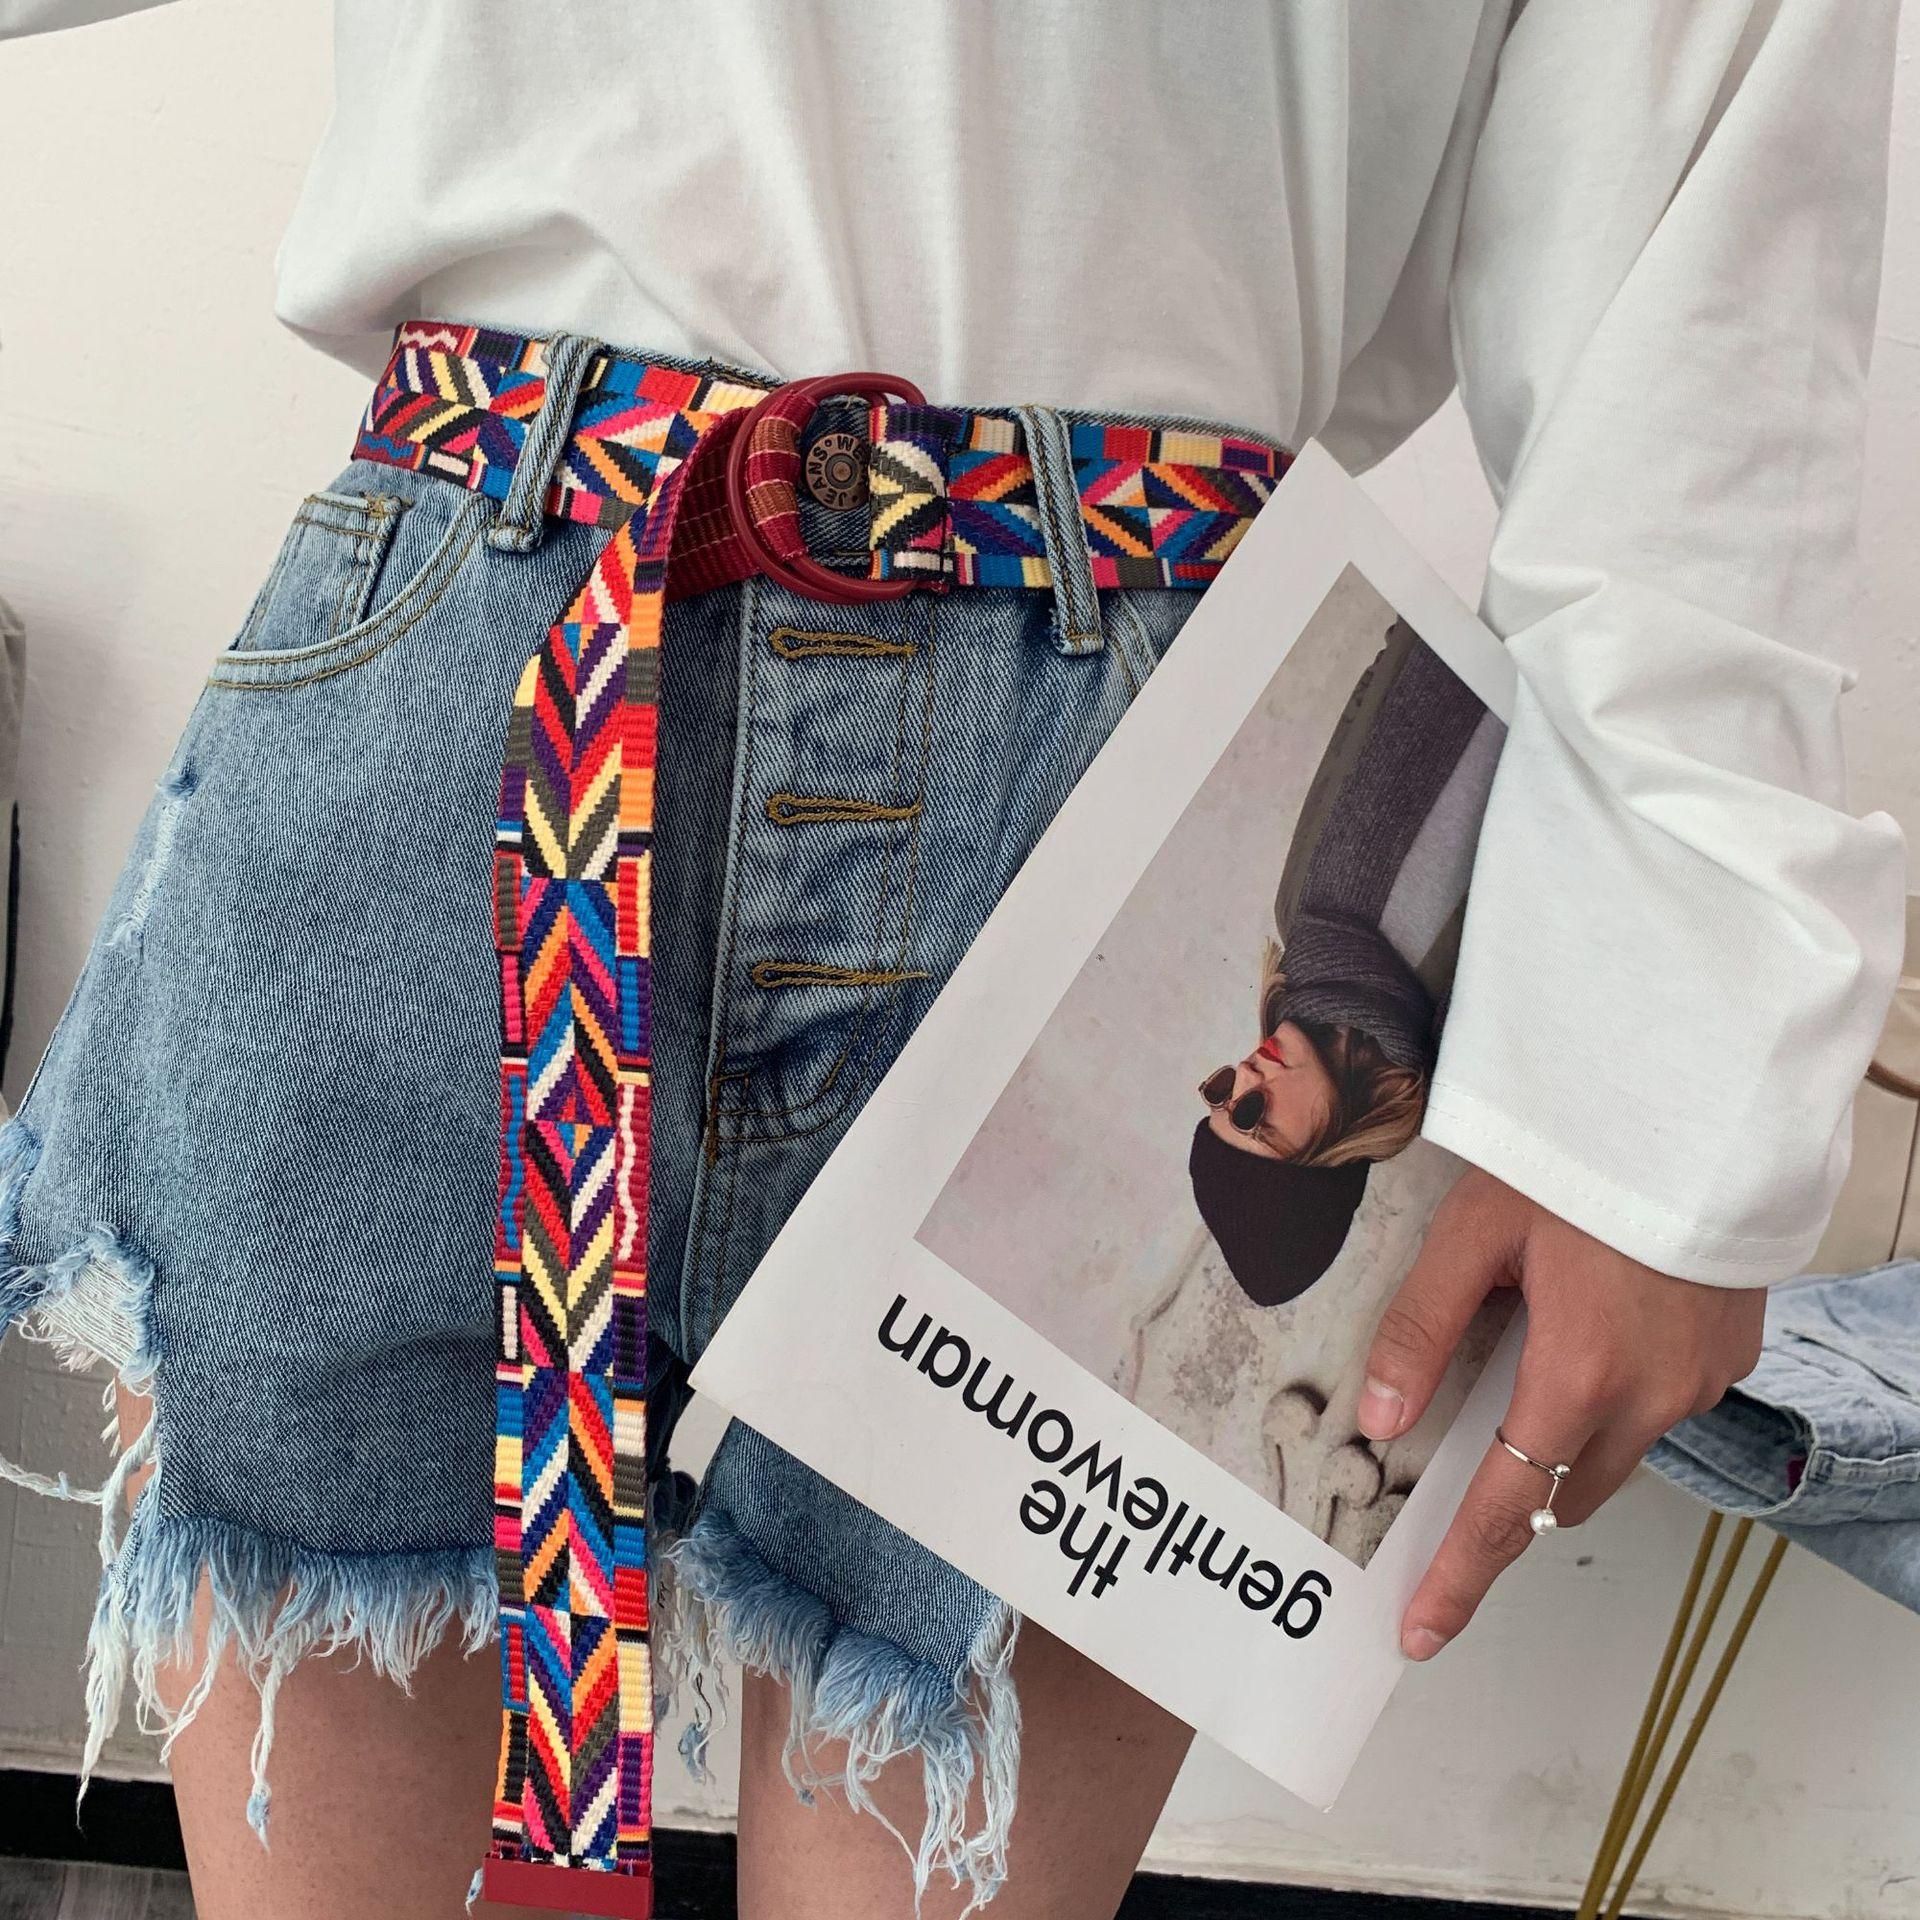 AWAYTR Hotselling Rainbow Canvas Women Belts Ethnic Style Belt Jean Belt Pin Buckle Colorful Long Waist Band